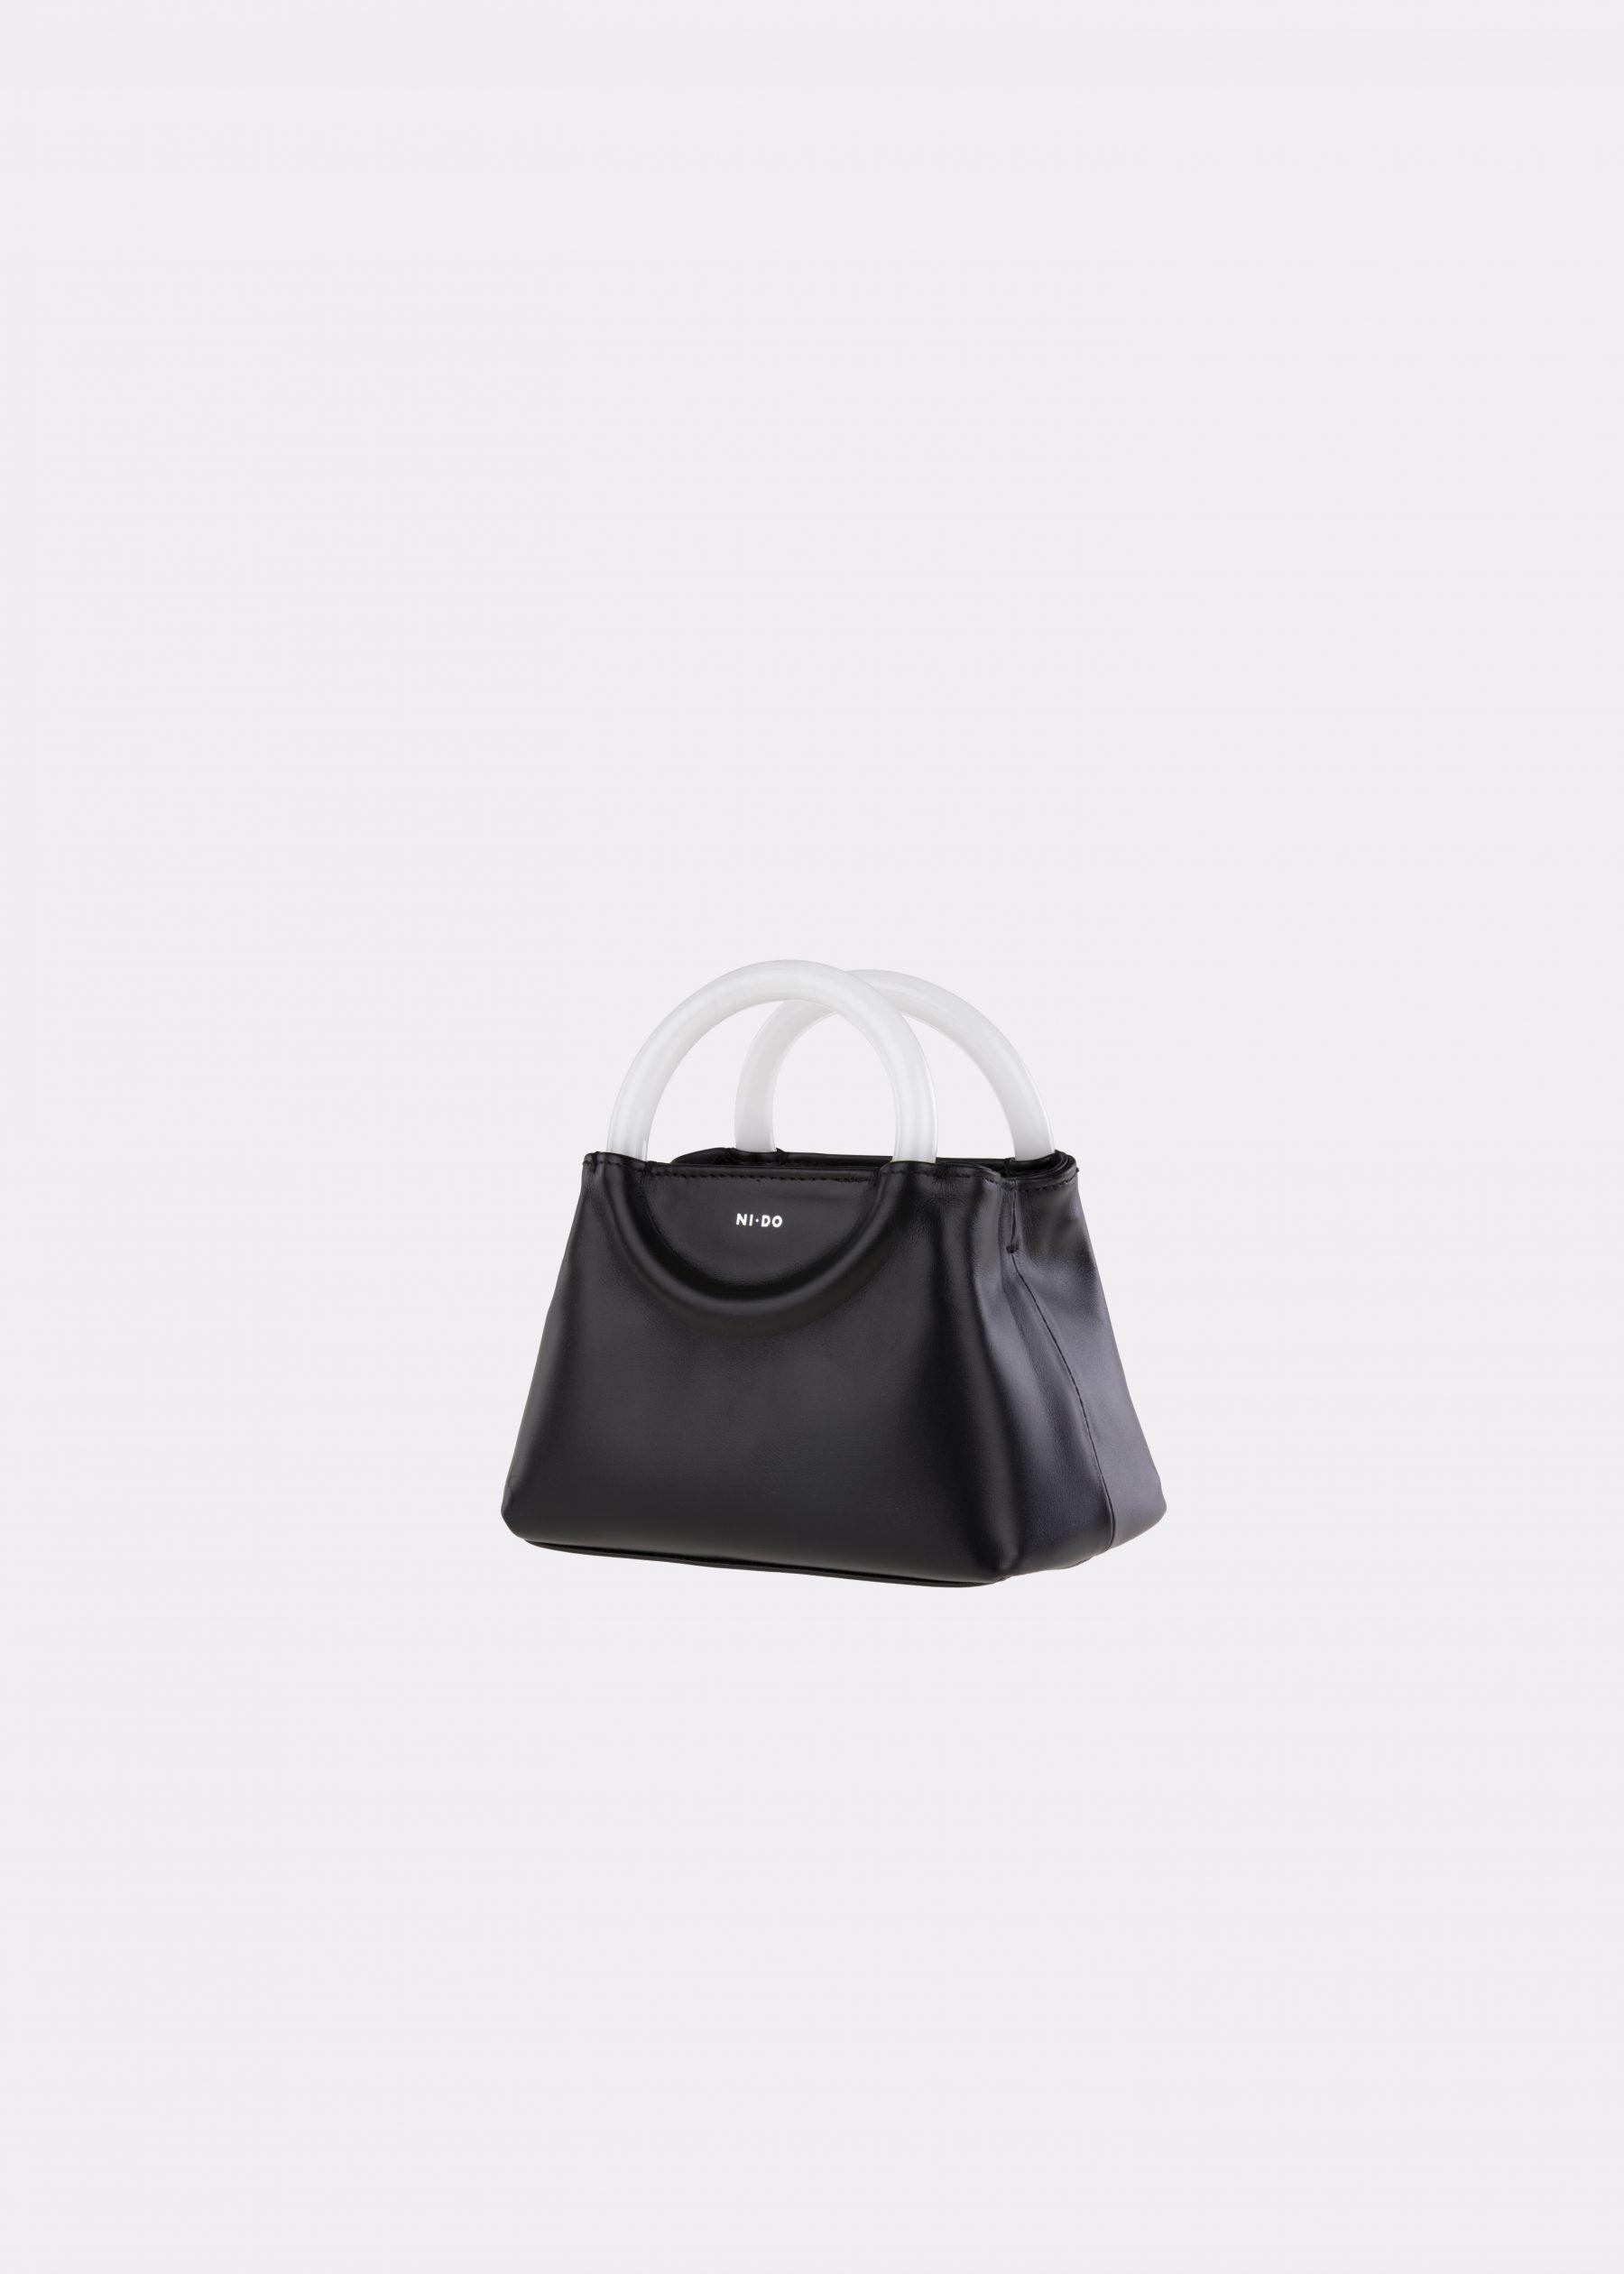 NIDO-Bolla_Mini-bag-Black-Pearl_side view